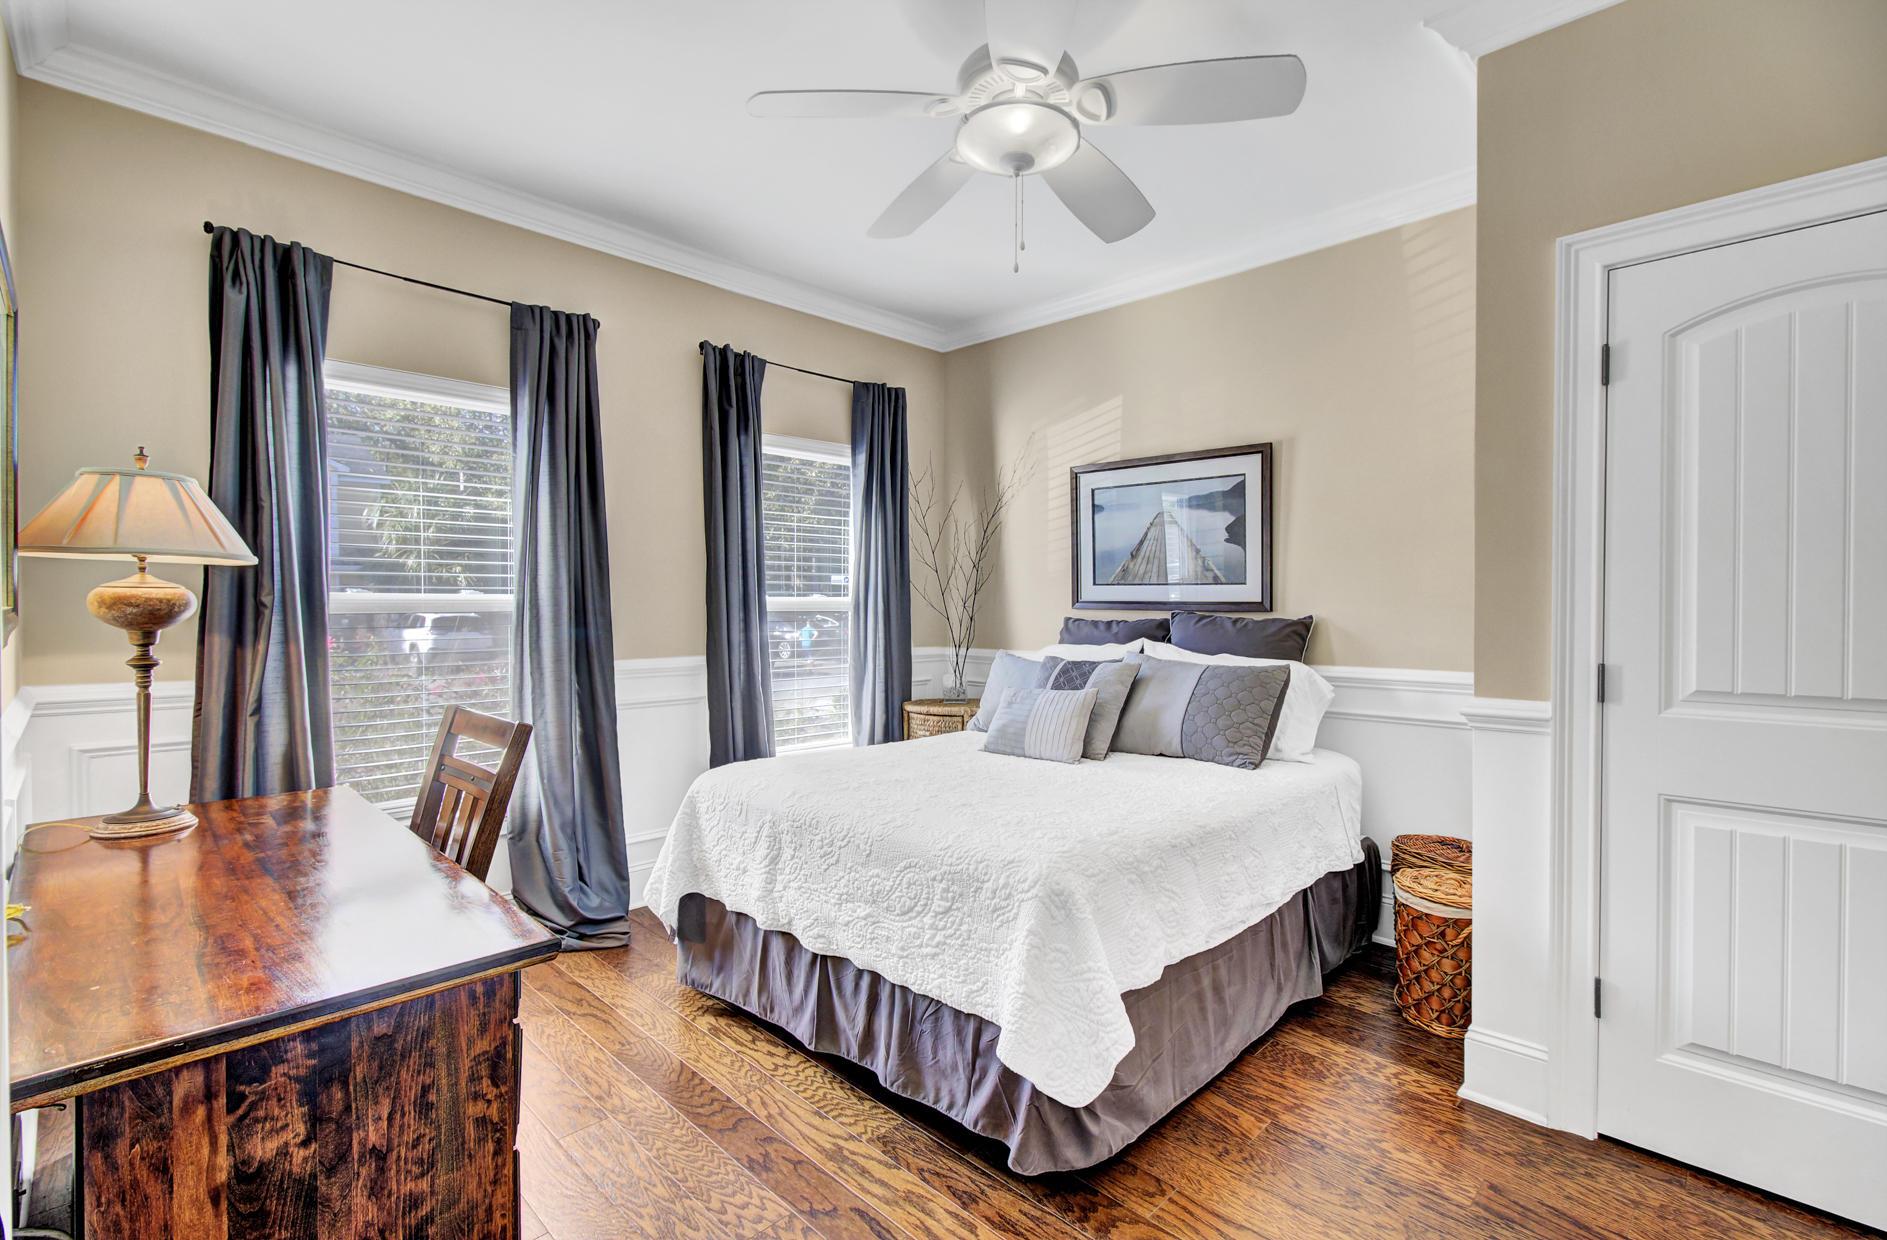 Carol Oaks Town Homes Homes For Sale - 2956 Emma, Mount Pleasant, SC - 27